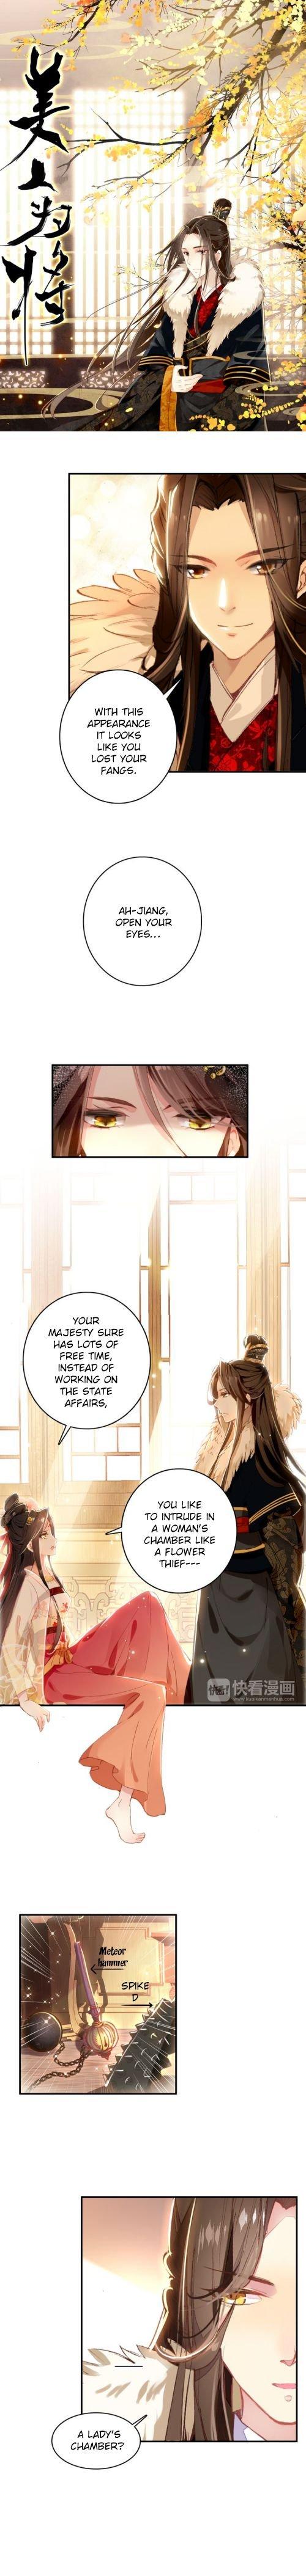 Manga She is a Beauty - Chapter 8 Page 1